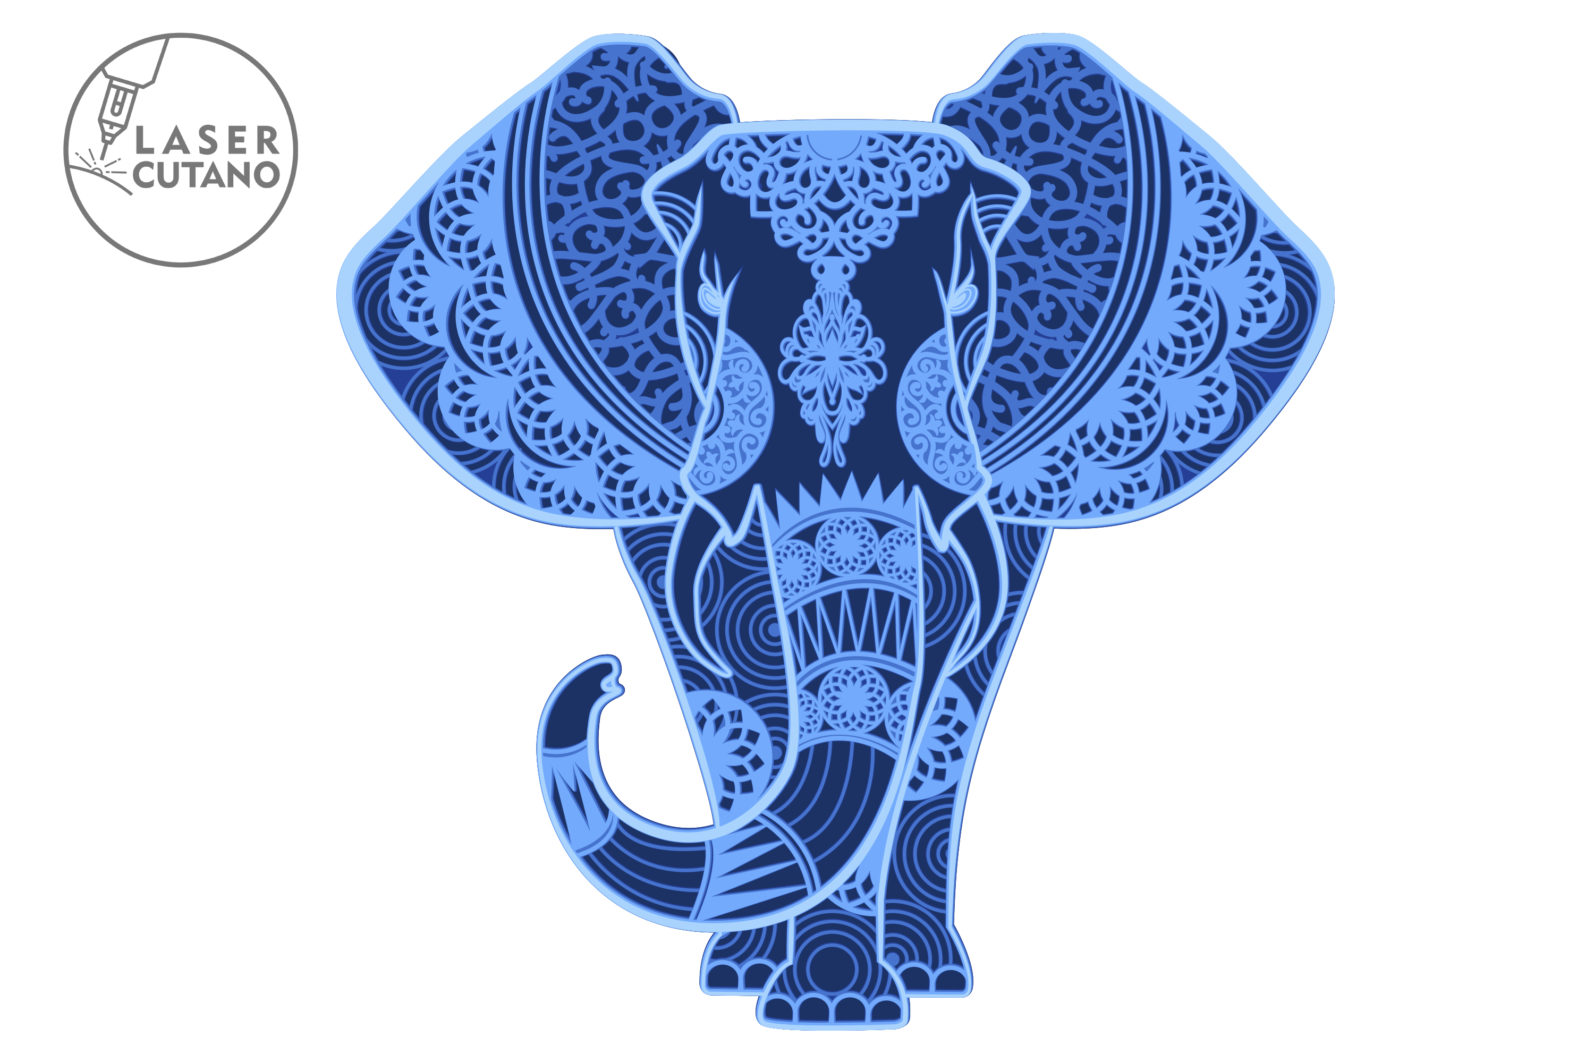 Multilayer Cut File ELEPHANT for Cricut or Laser Cut - elephant laser cut files lasercutano 3 scaled -